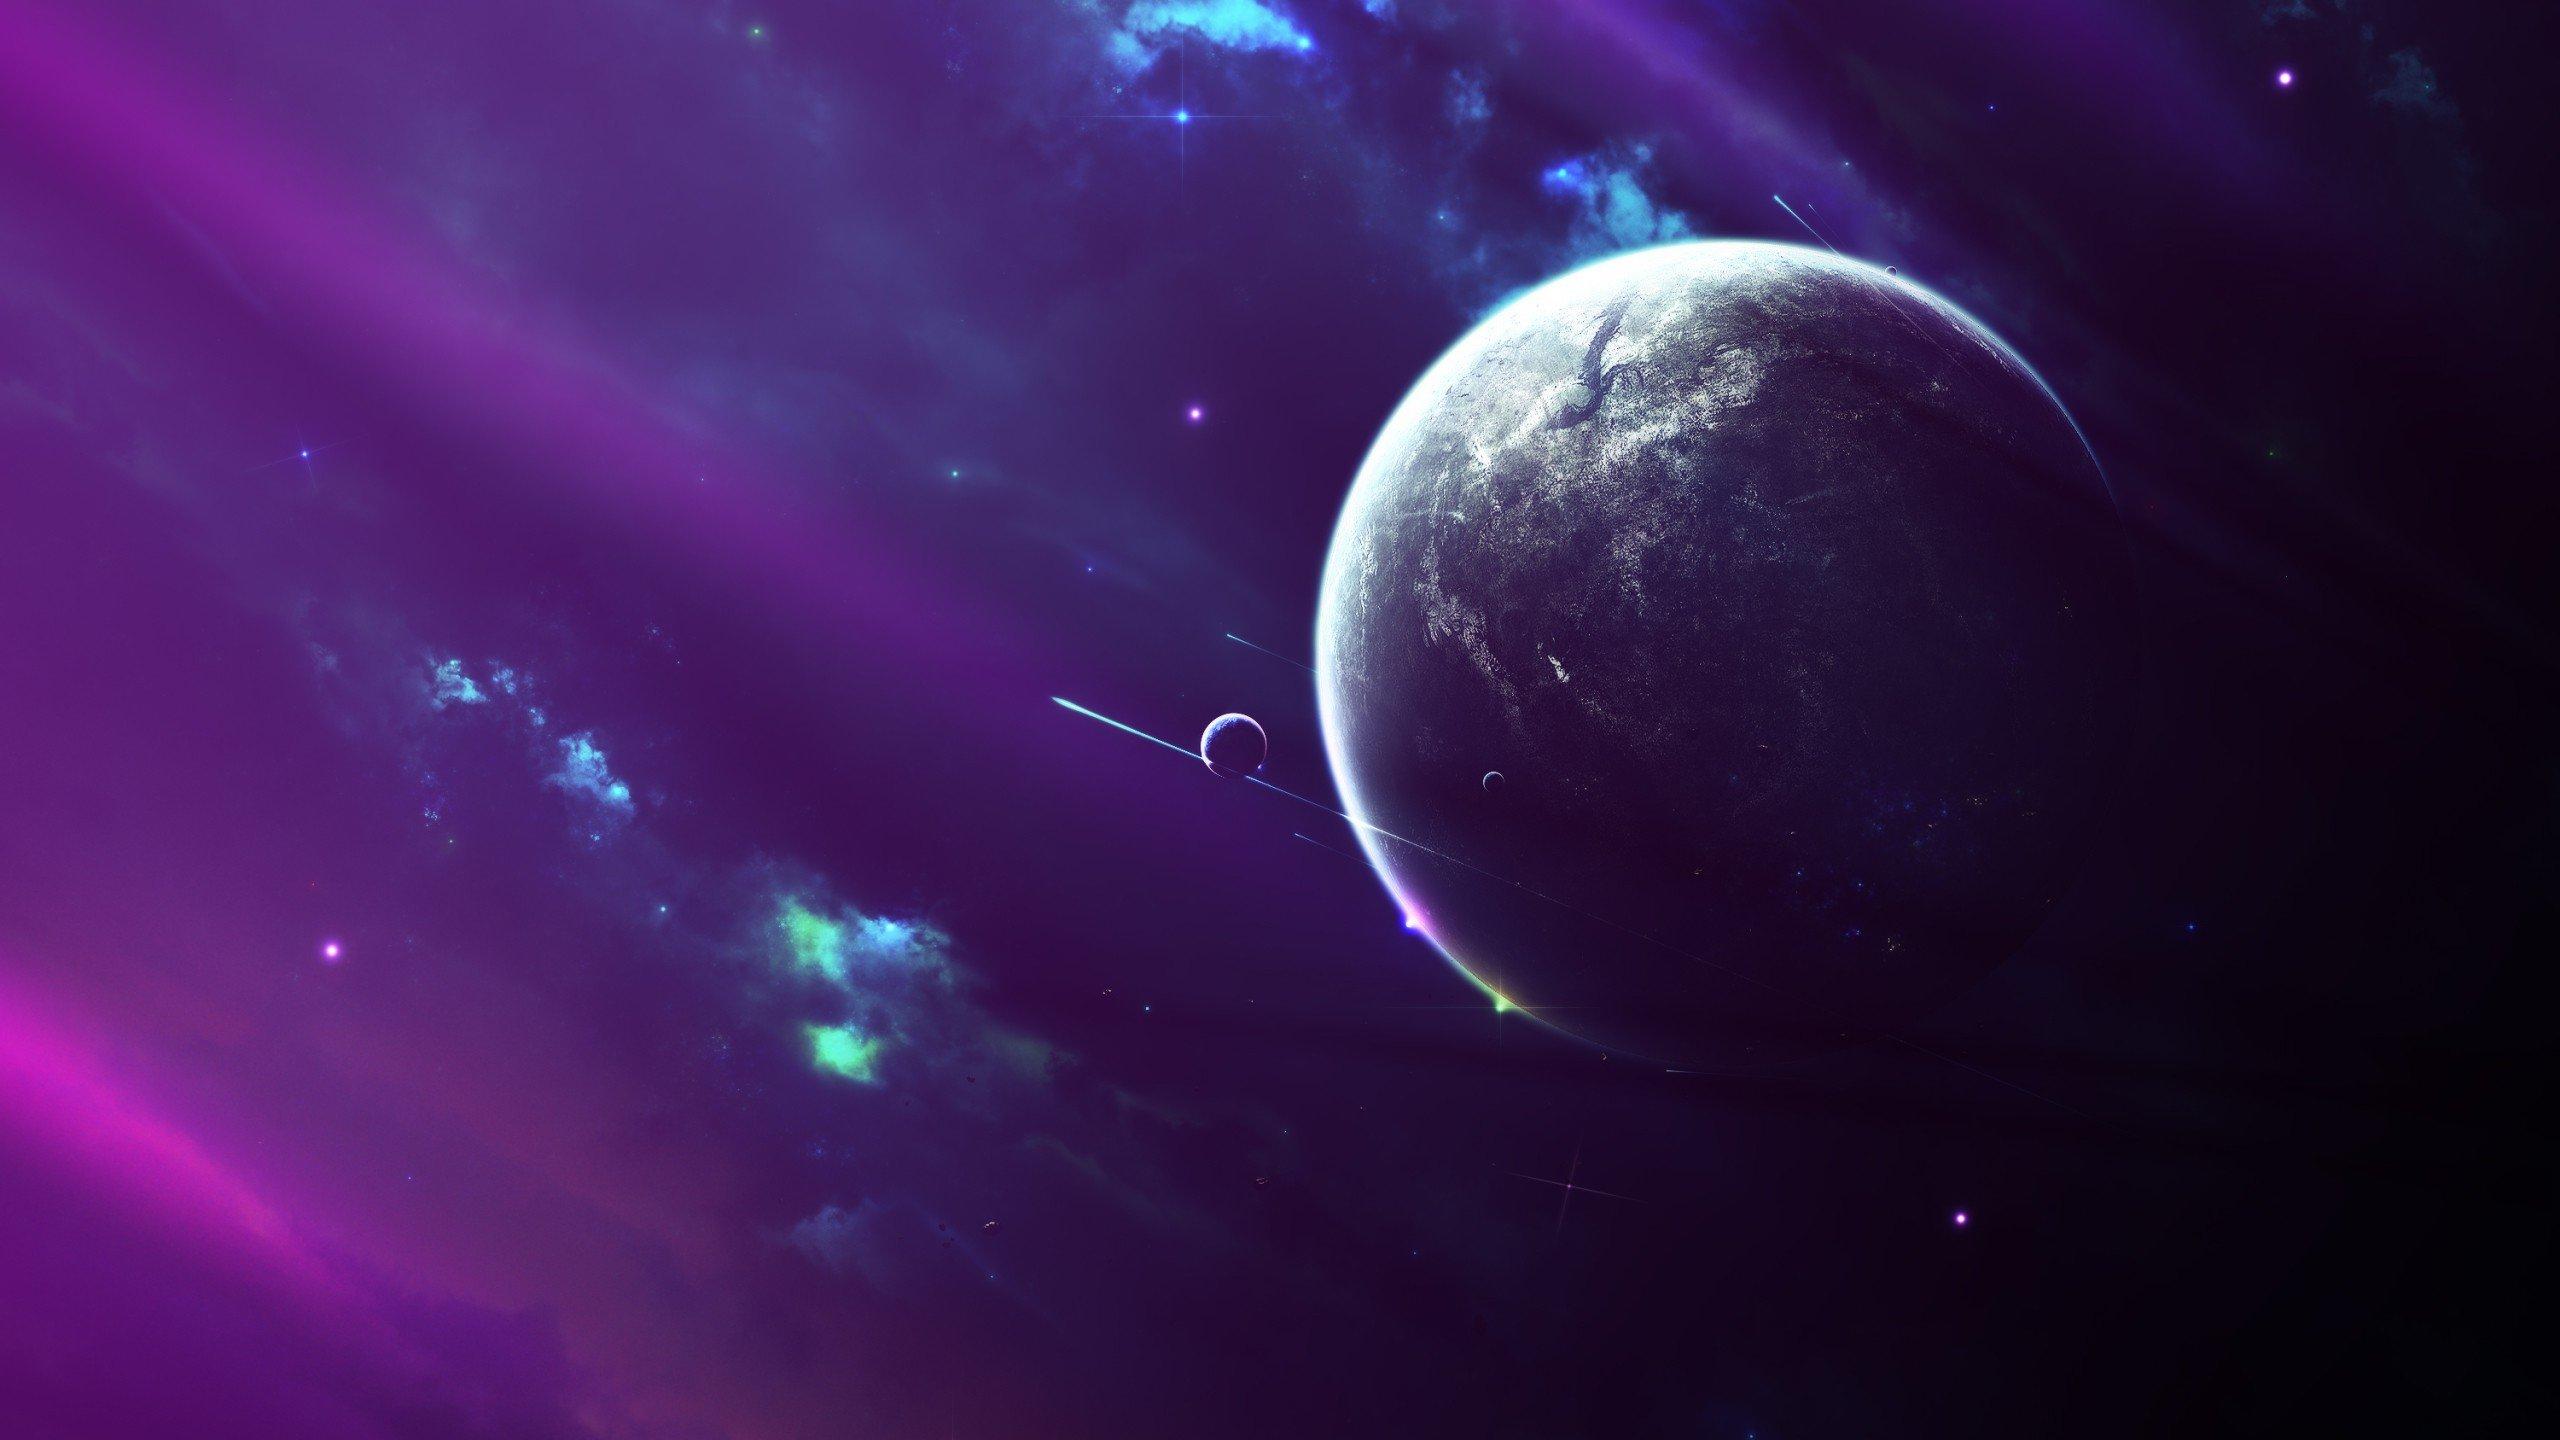 space, Moon, Nebula Wallpaper